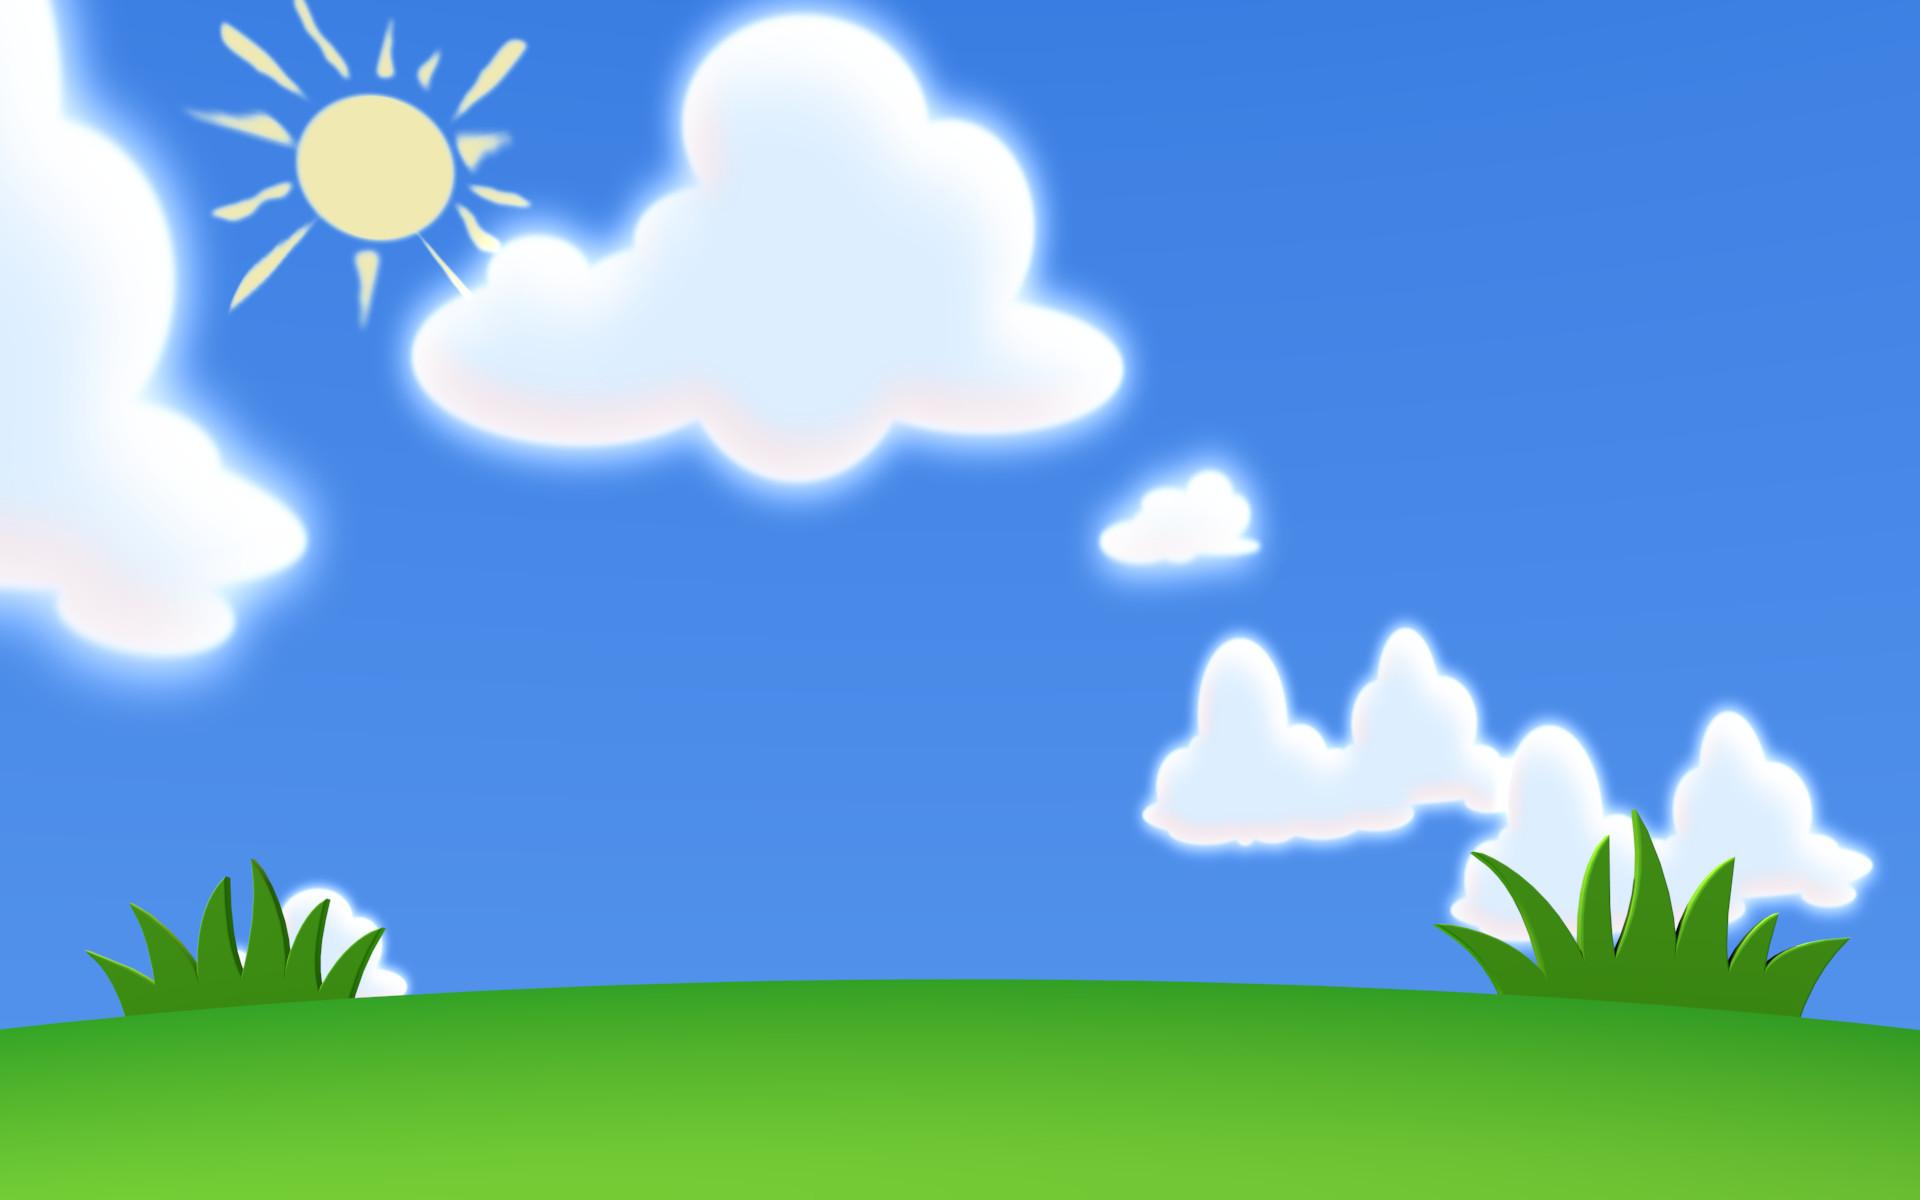 pin Cloud clipart sky #14